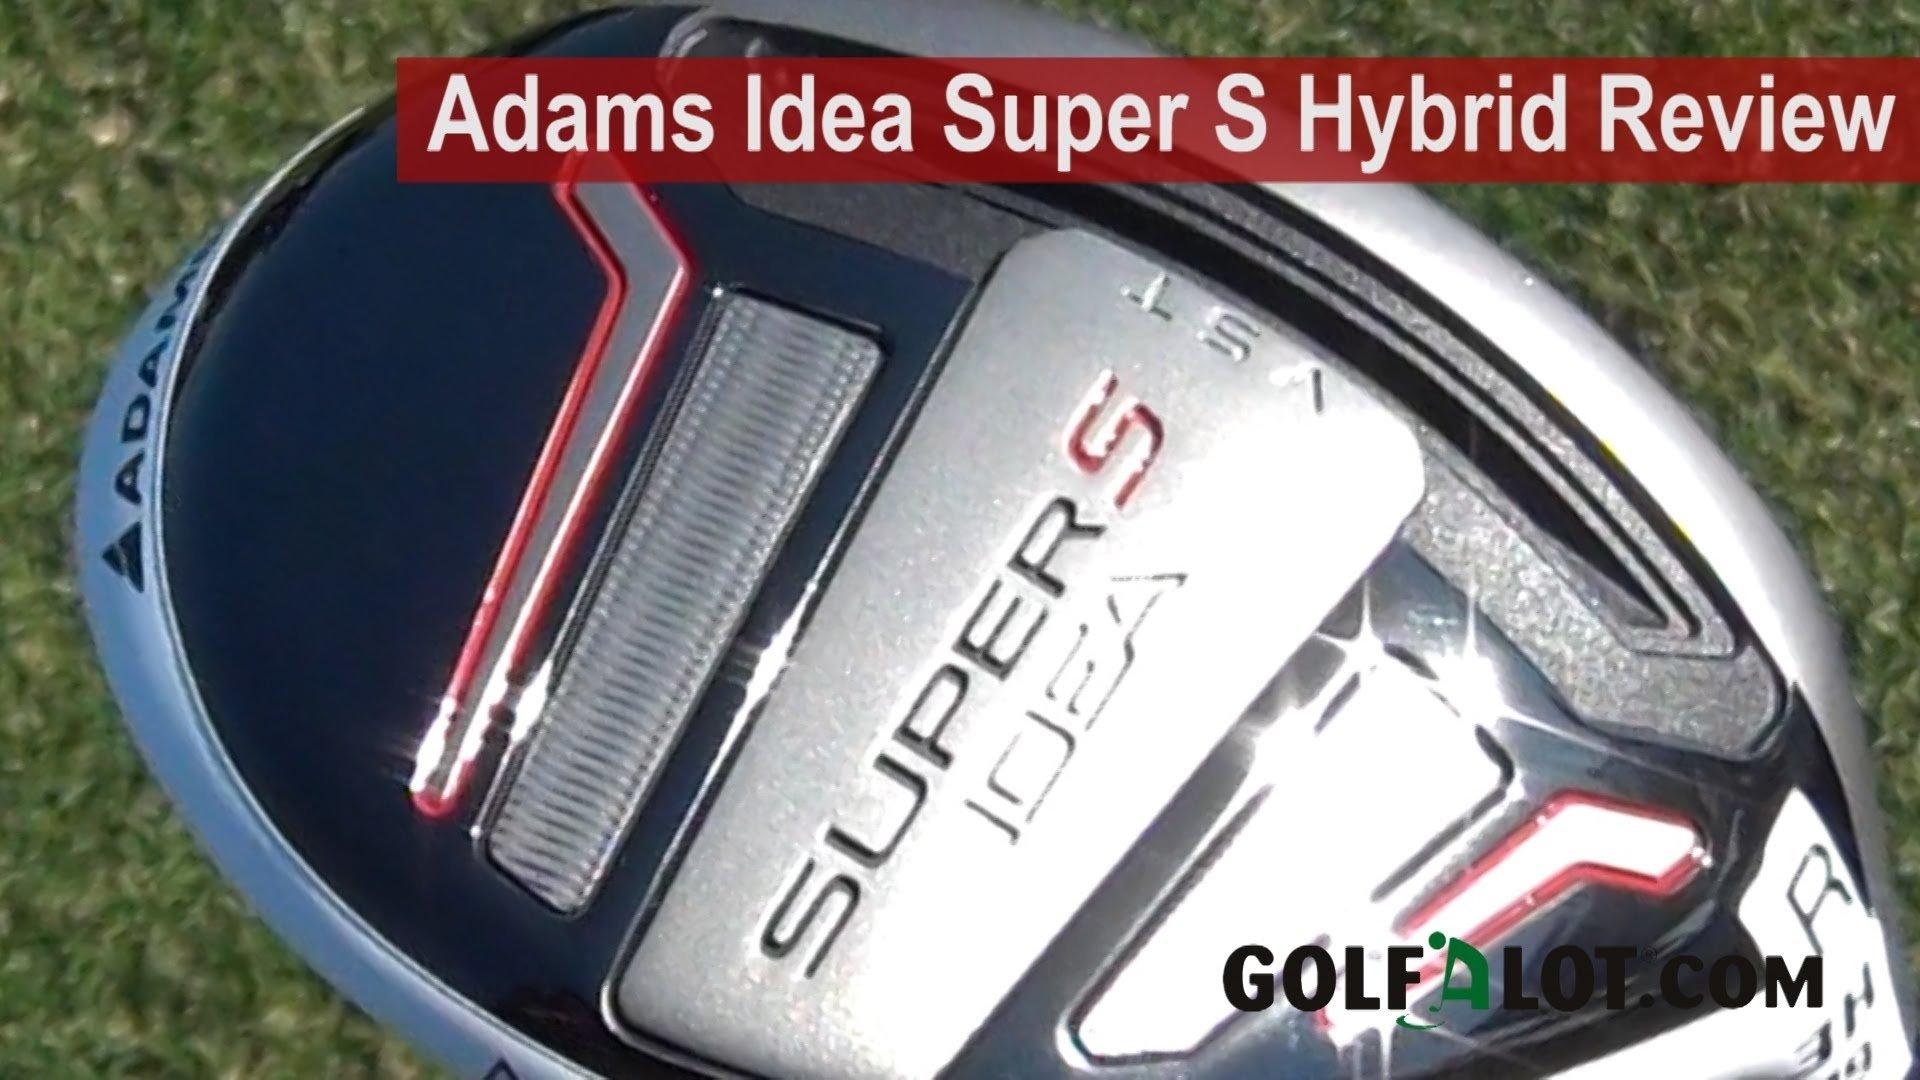 10 Attractive Adams Idea Super Hybrid Review adams ideas super s hybrid reviewgolfalot youtube 2021